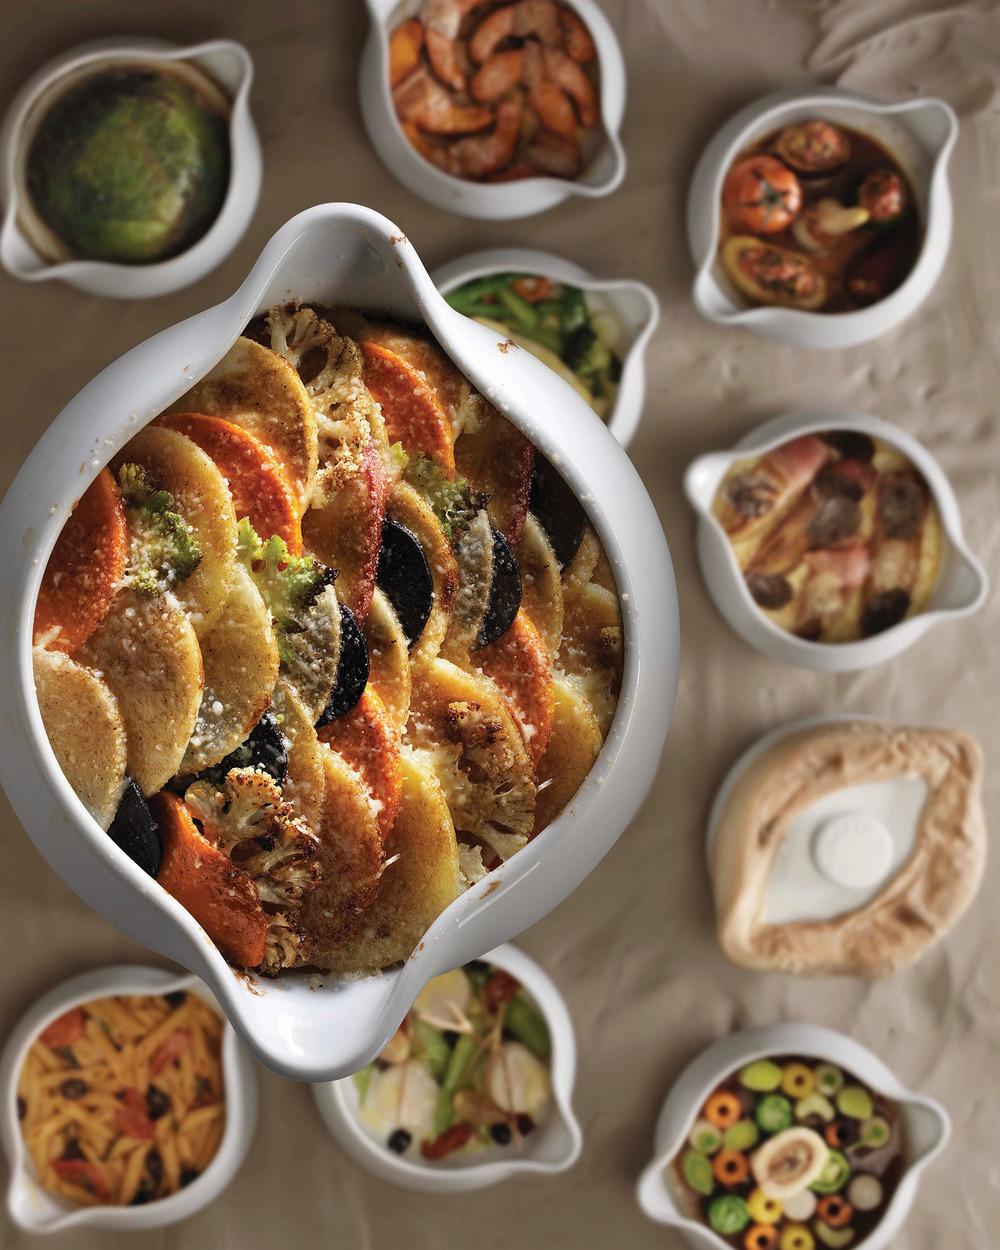 Alain Ducasse的招牌菜──砂鍋燉菜,這道菜非常符合他的一貫理念,即全球本土化。Photography by T.Duval